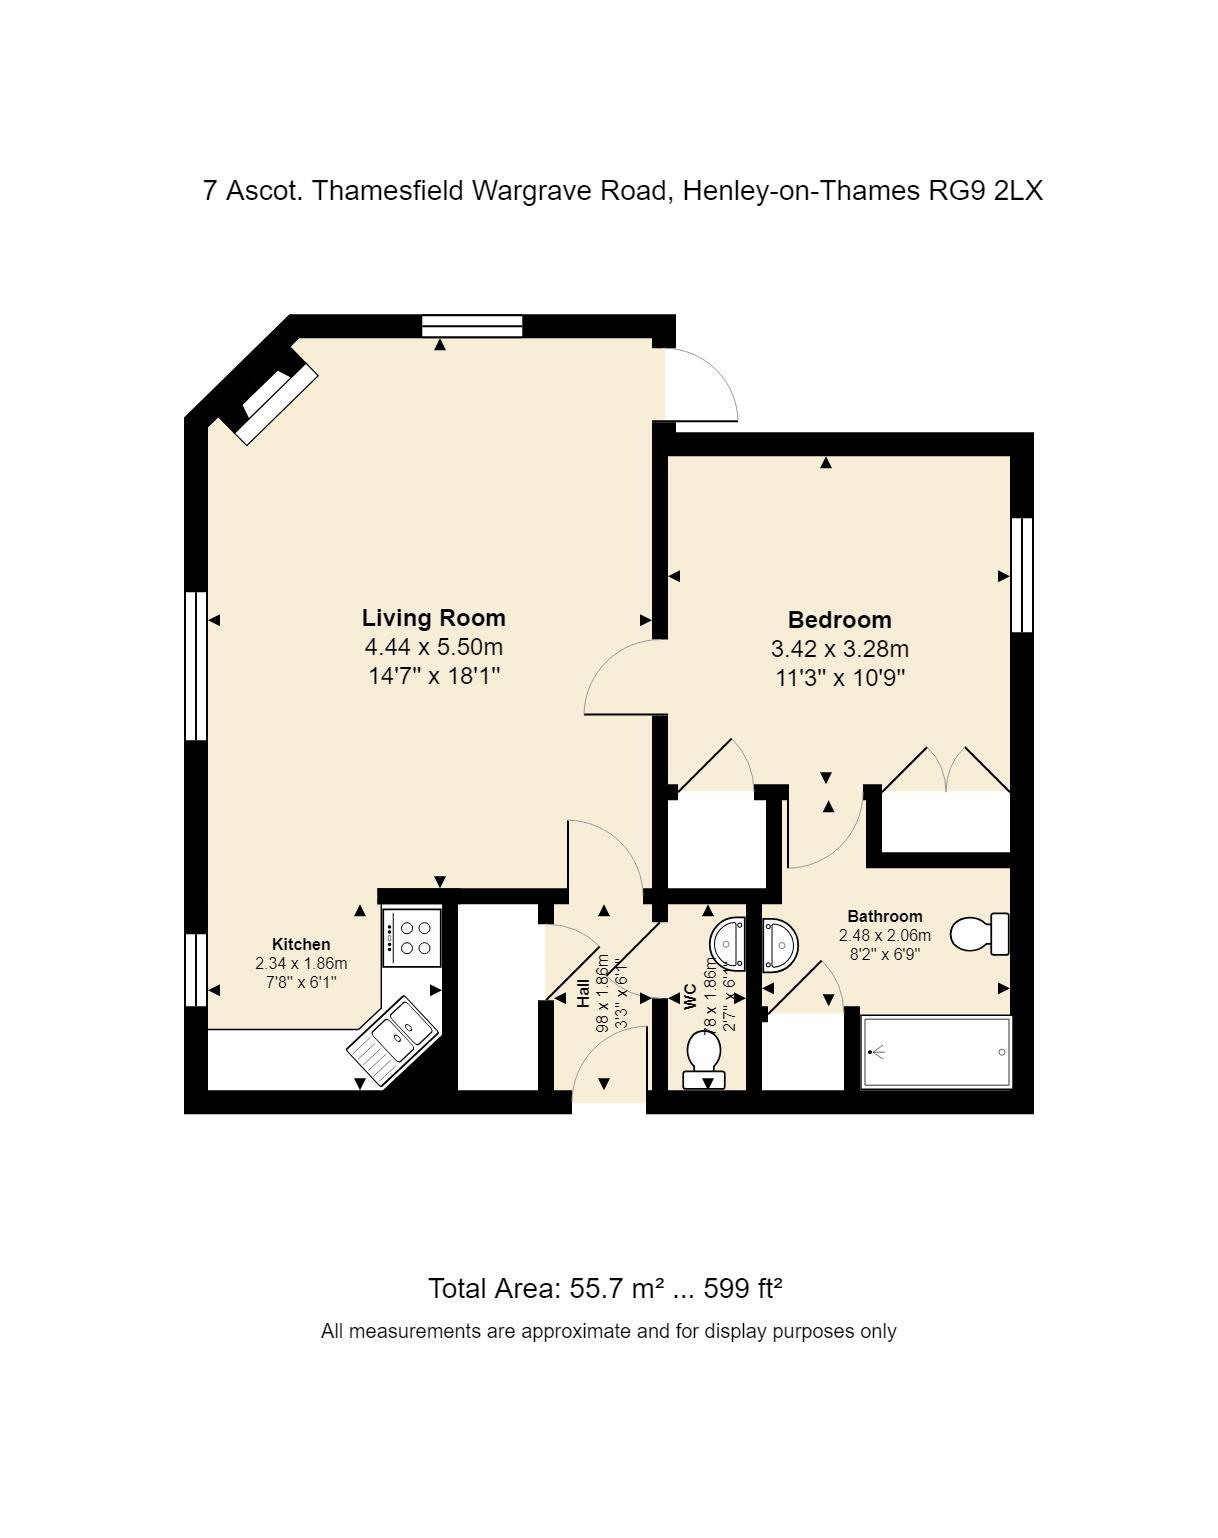 7 Ascot Floorplan